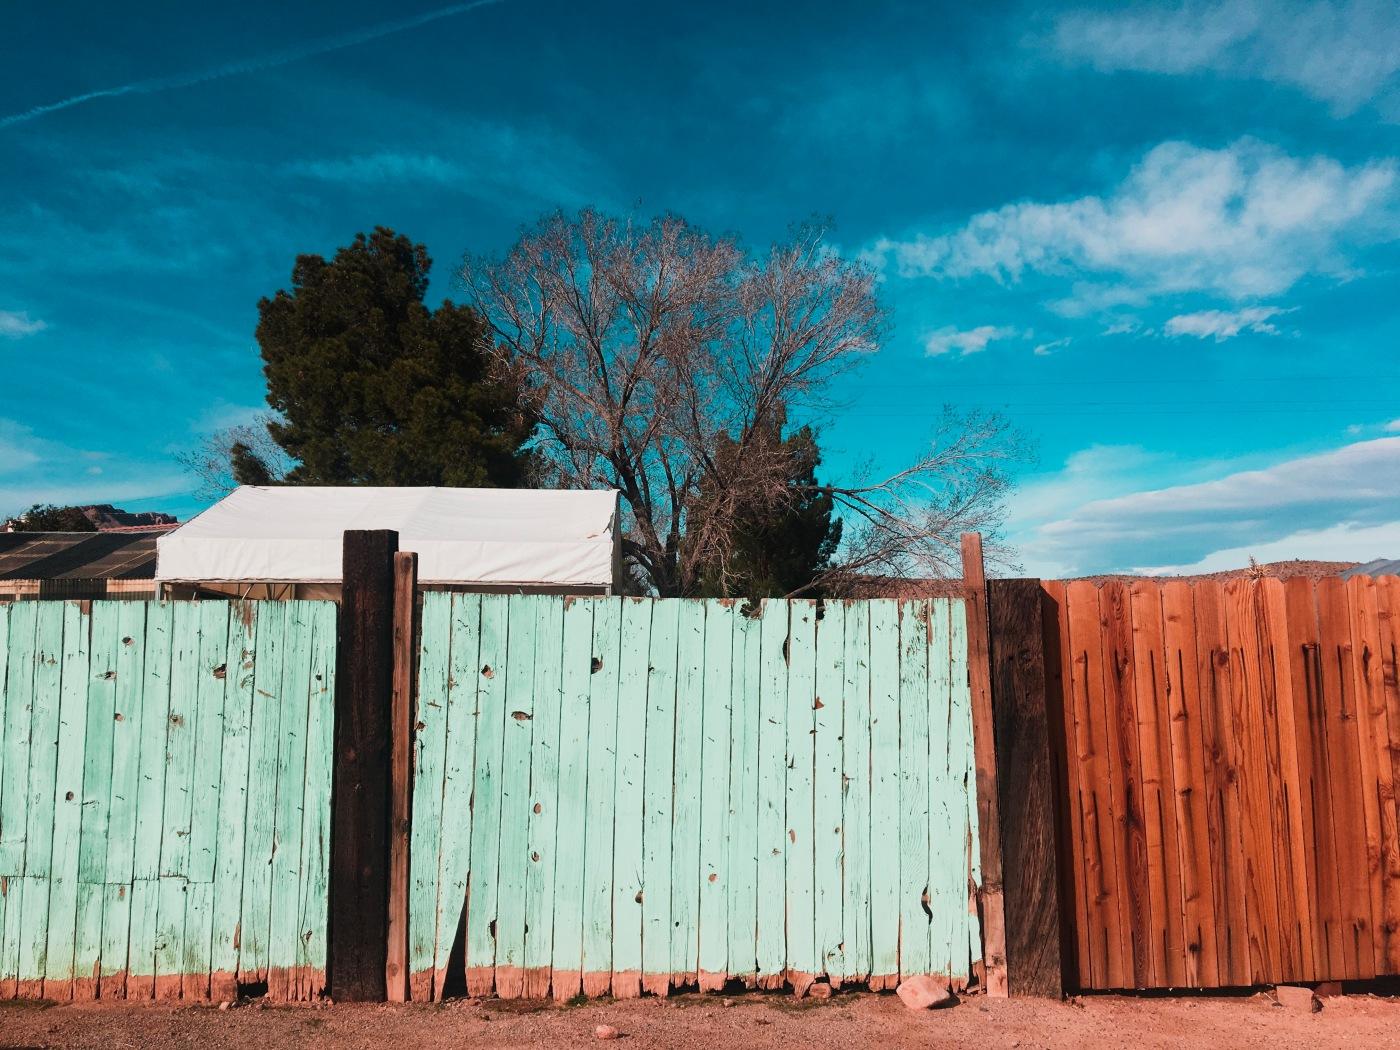 Las Vegas | Saturday at Cactus Joe's – The Golden Lining